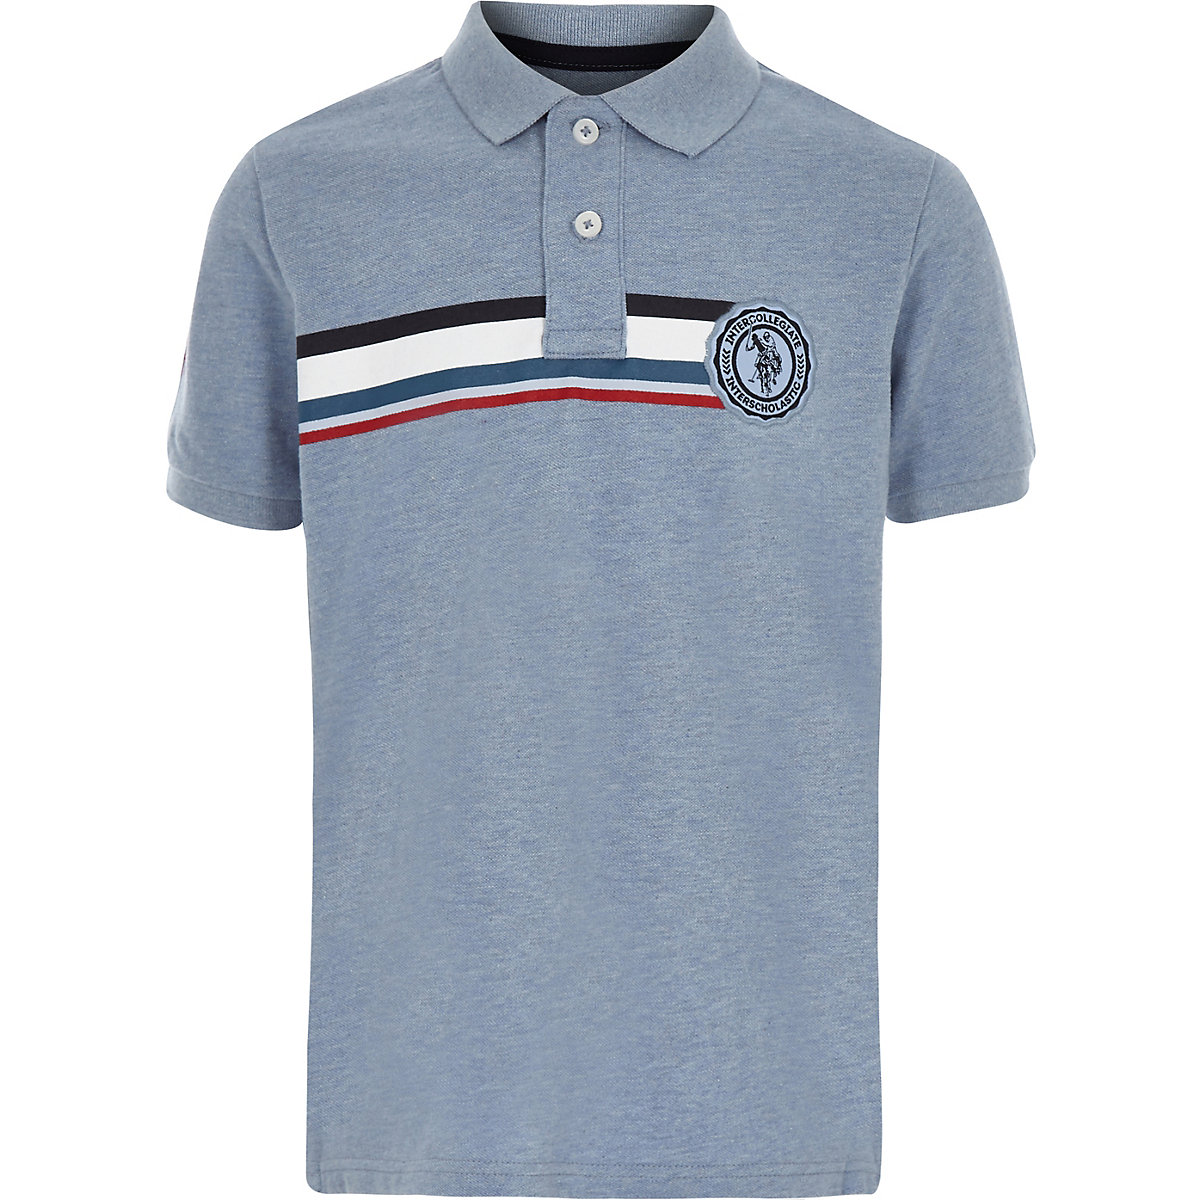 Boys navy stripe U.S. Polo Assn. T-shirt